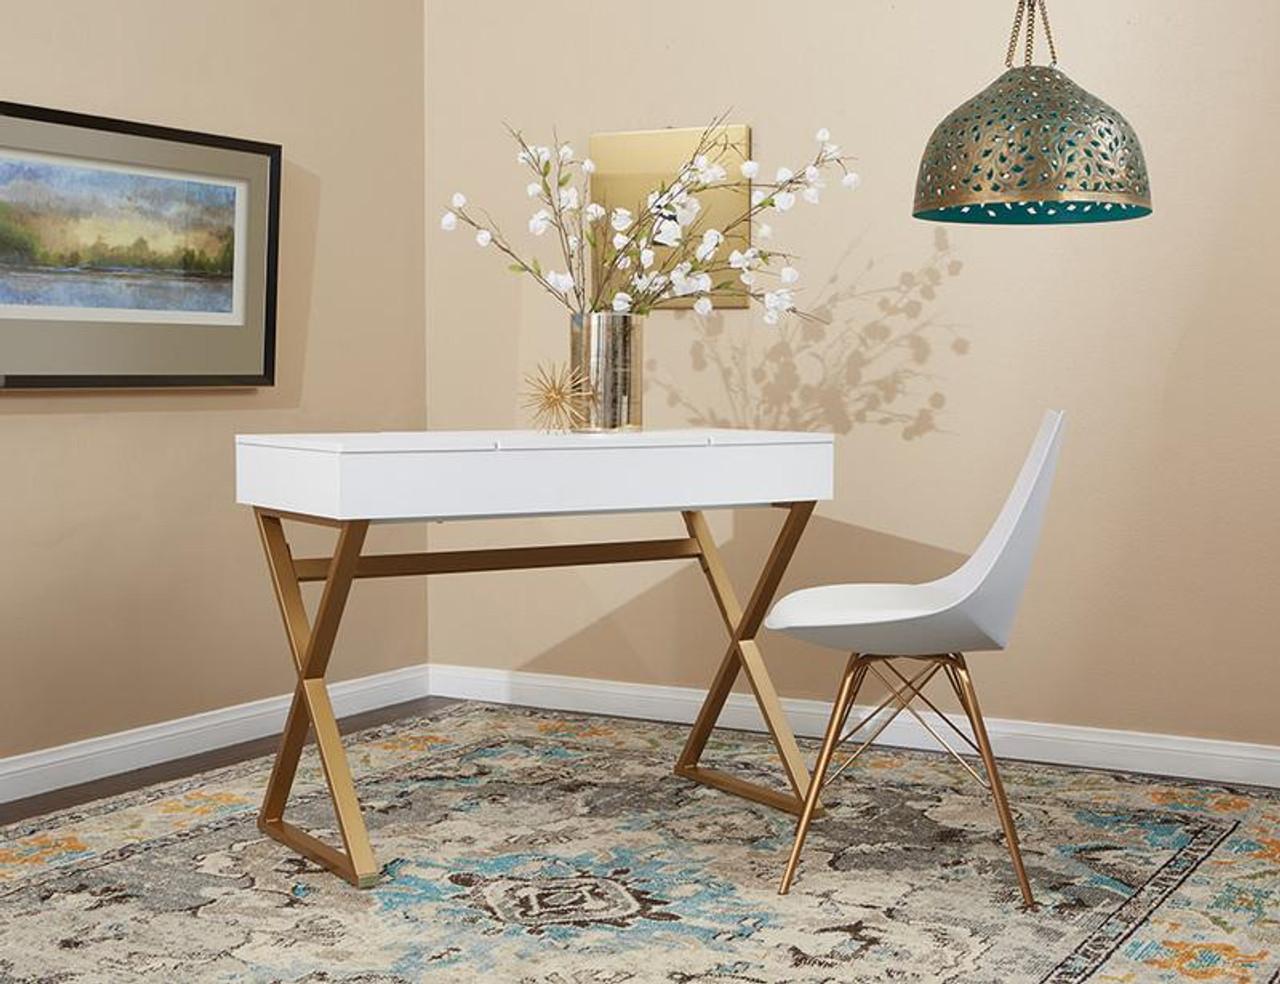 Office Star Juliette Vanity Desk With White Top And Gold Legs K D Jul789v Wh